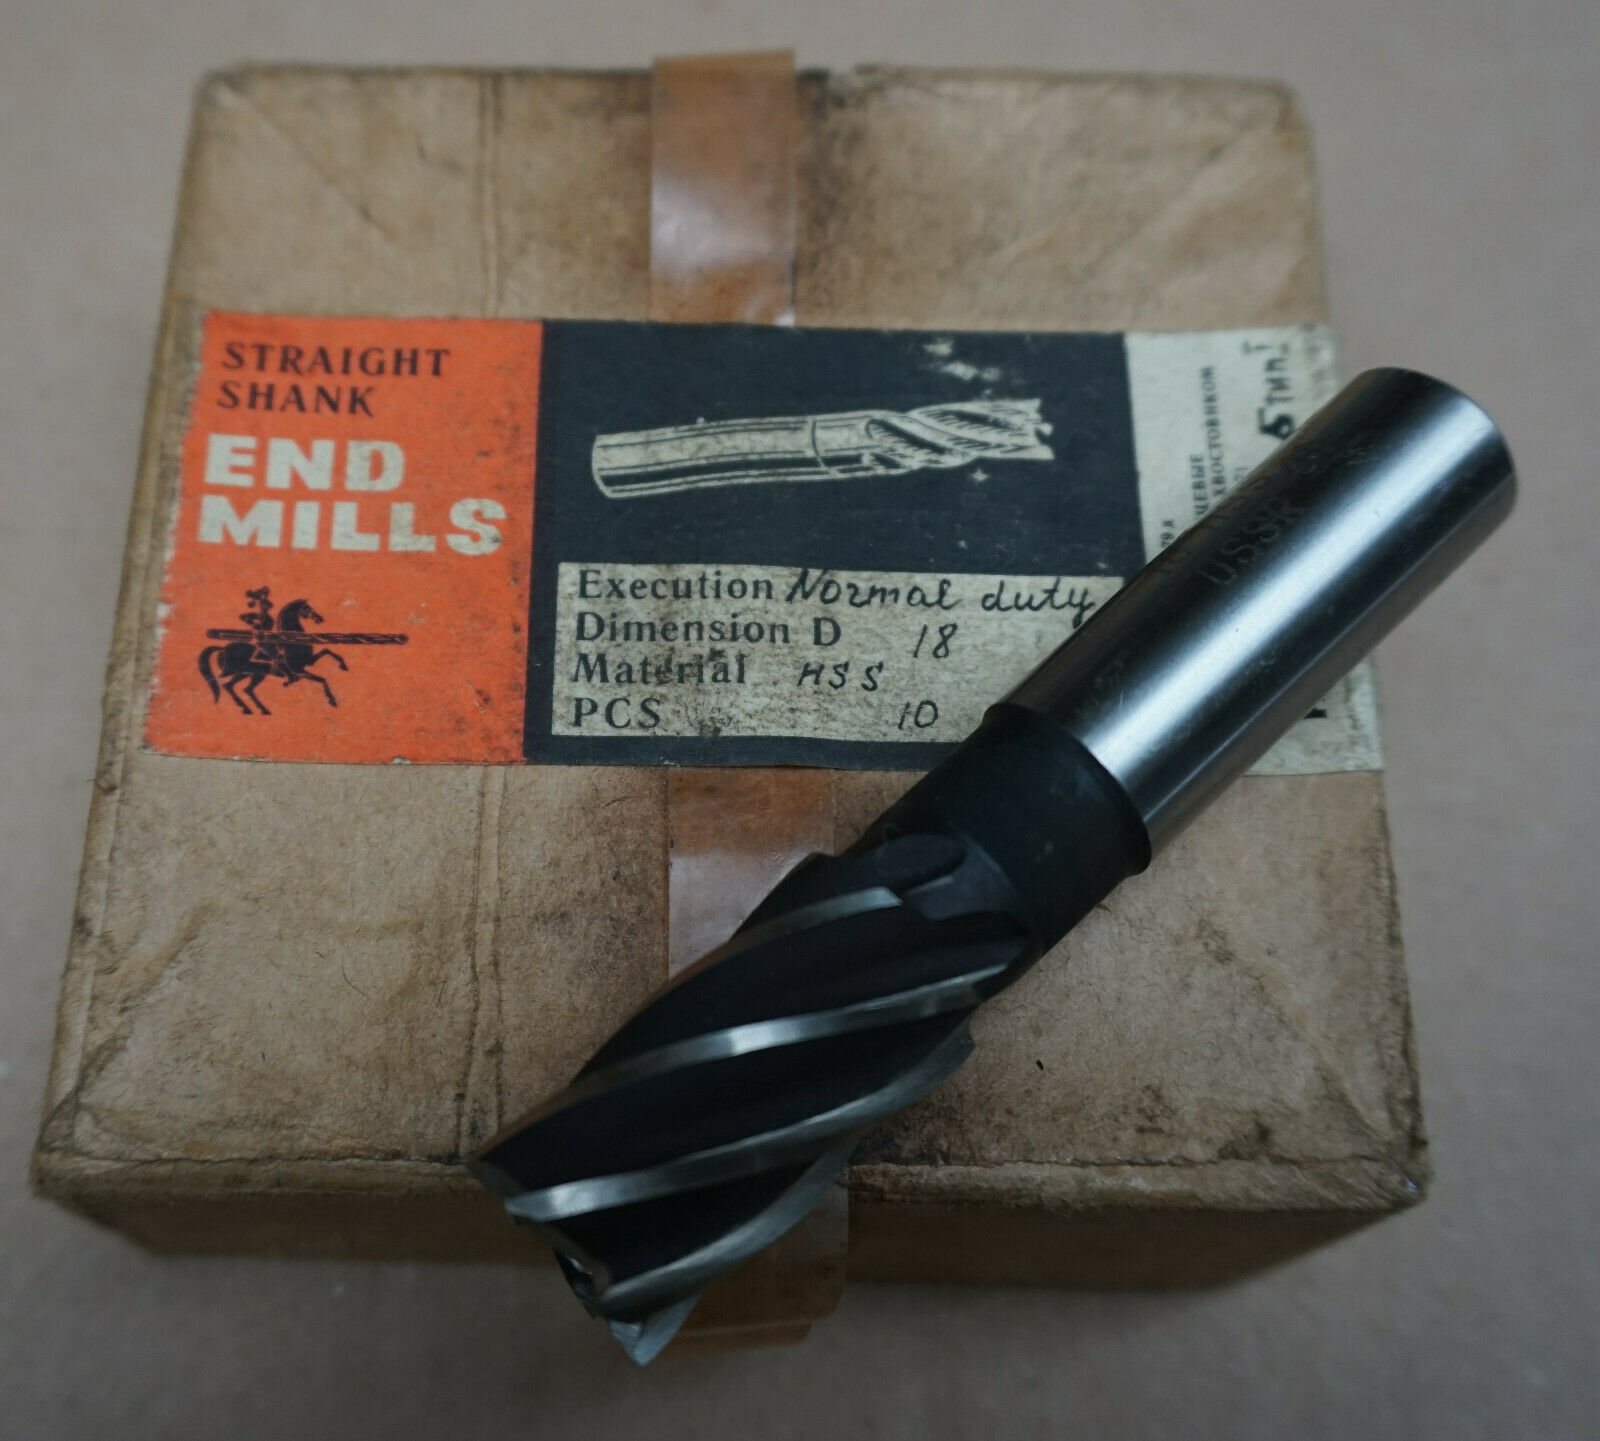 W020-1062: HSS Langlochfräser Schaftfräser Durchmesser 18mm USSR